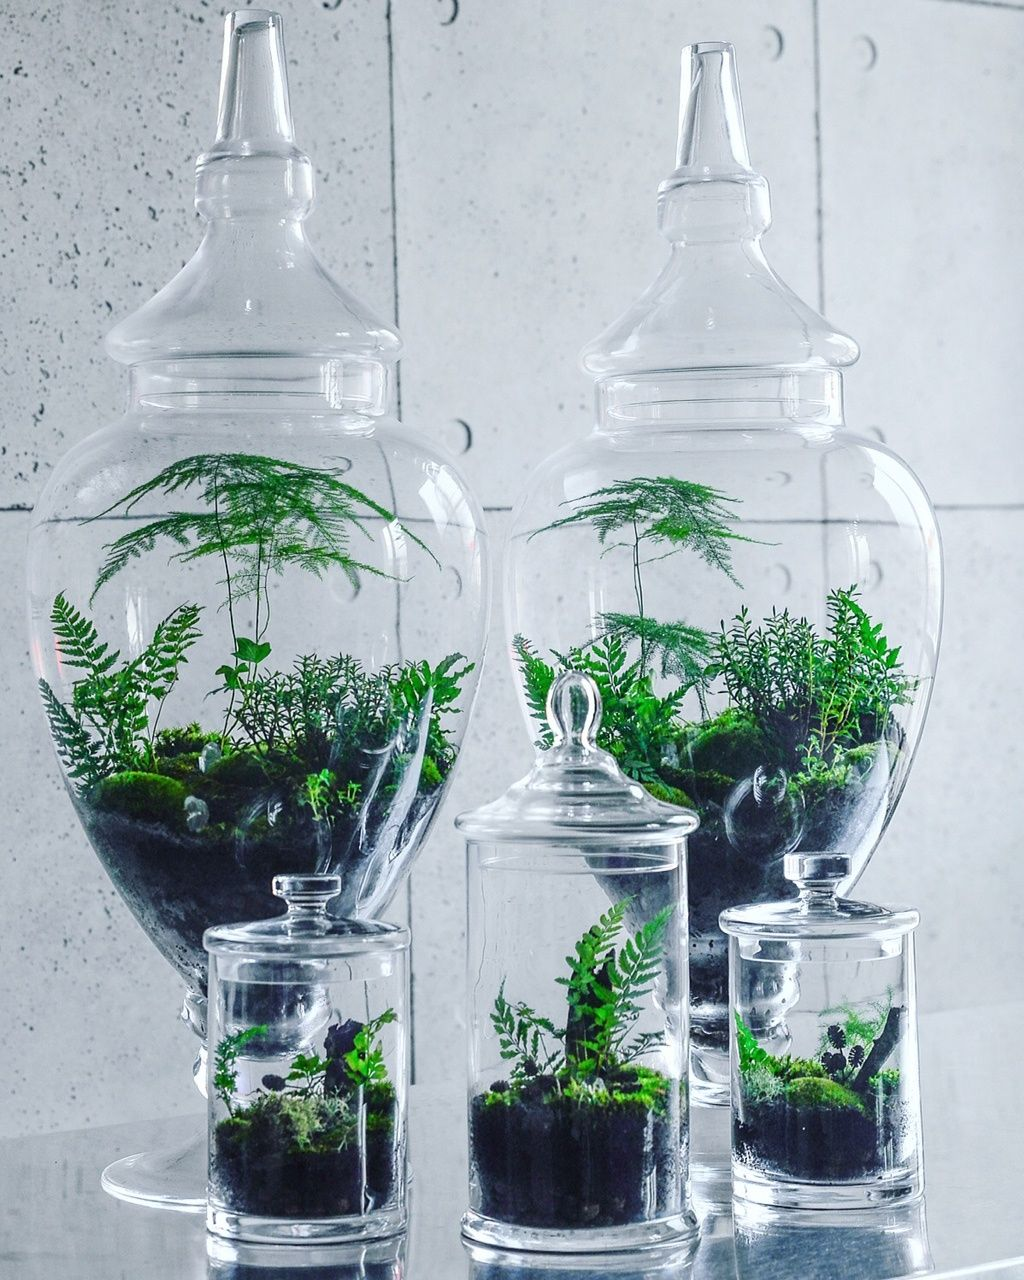 Pin by tojestmag on pomysły do domu pinterest plants and gardens